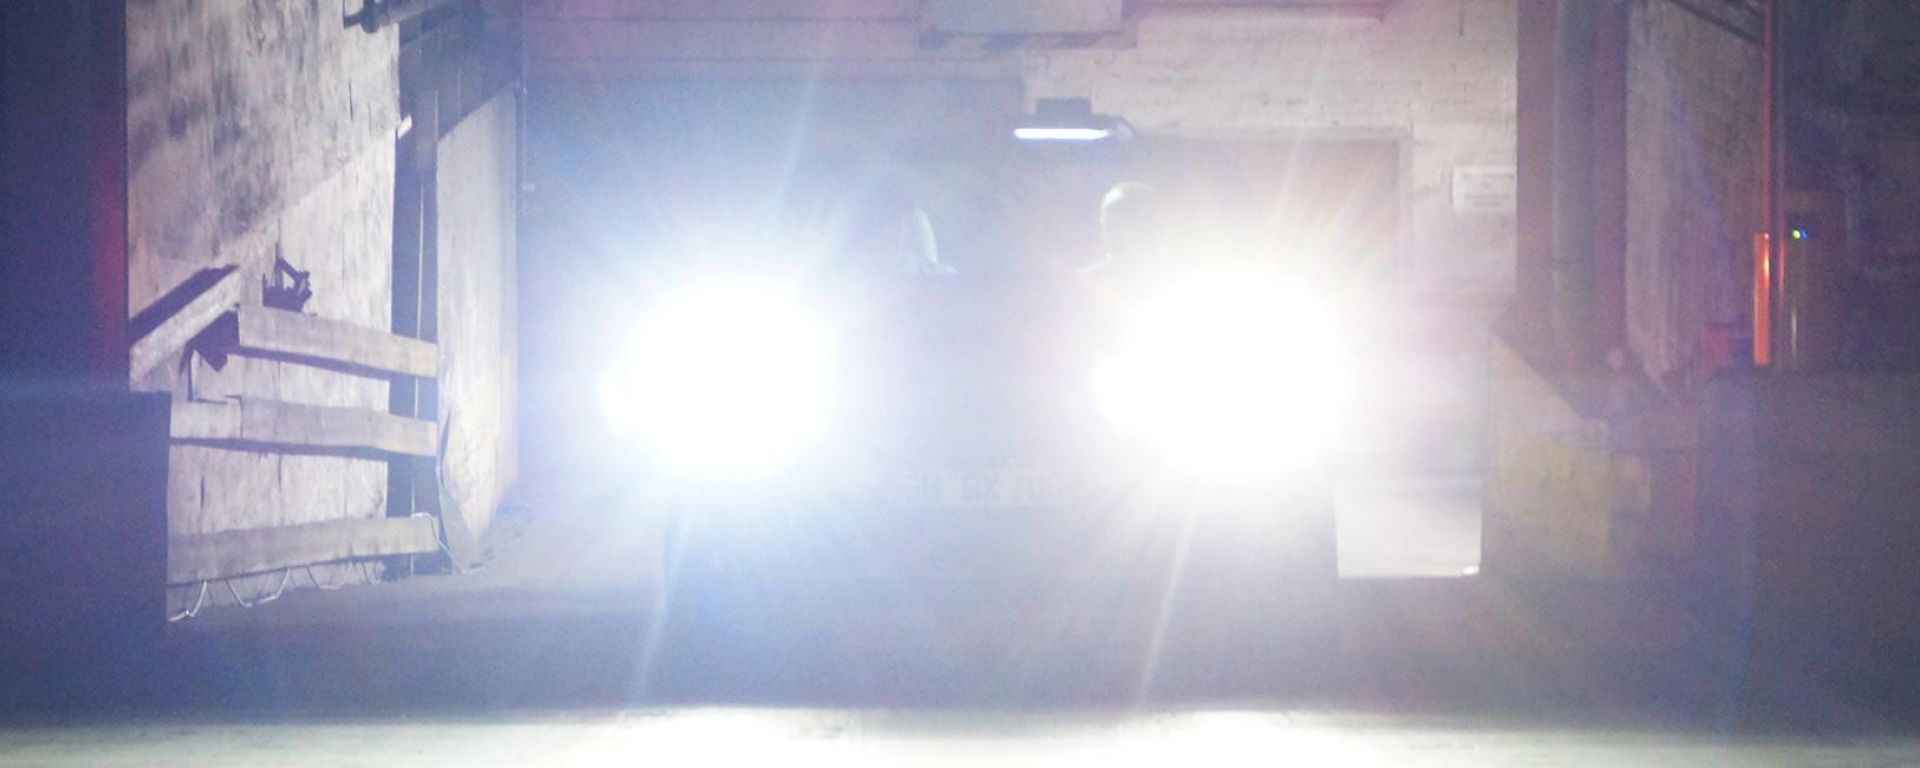 Opel Grandland X, il teaser